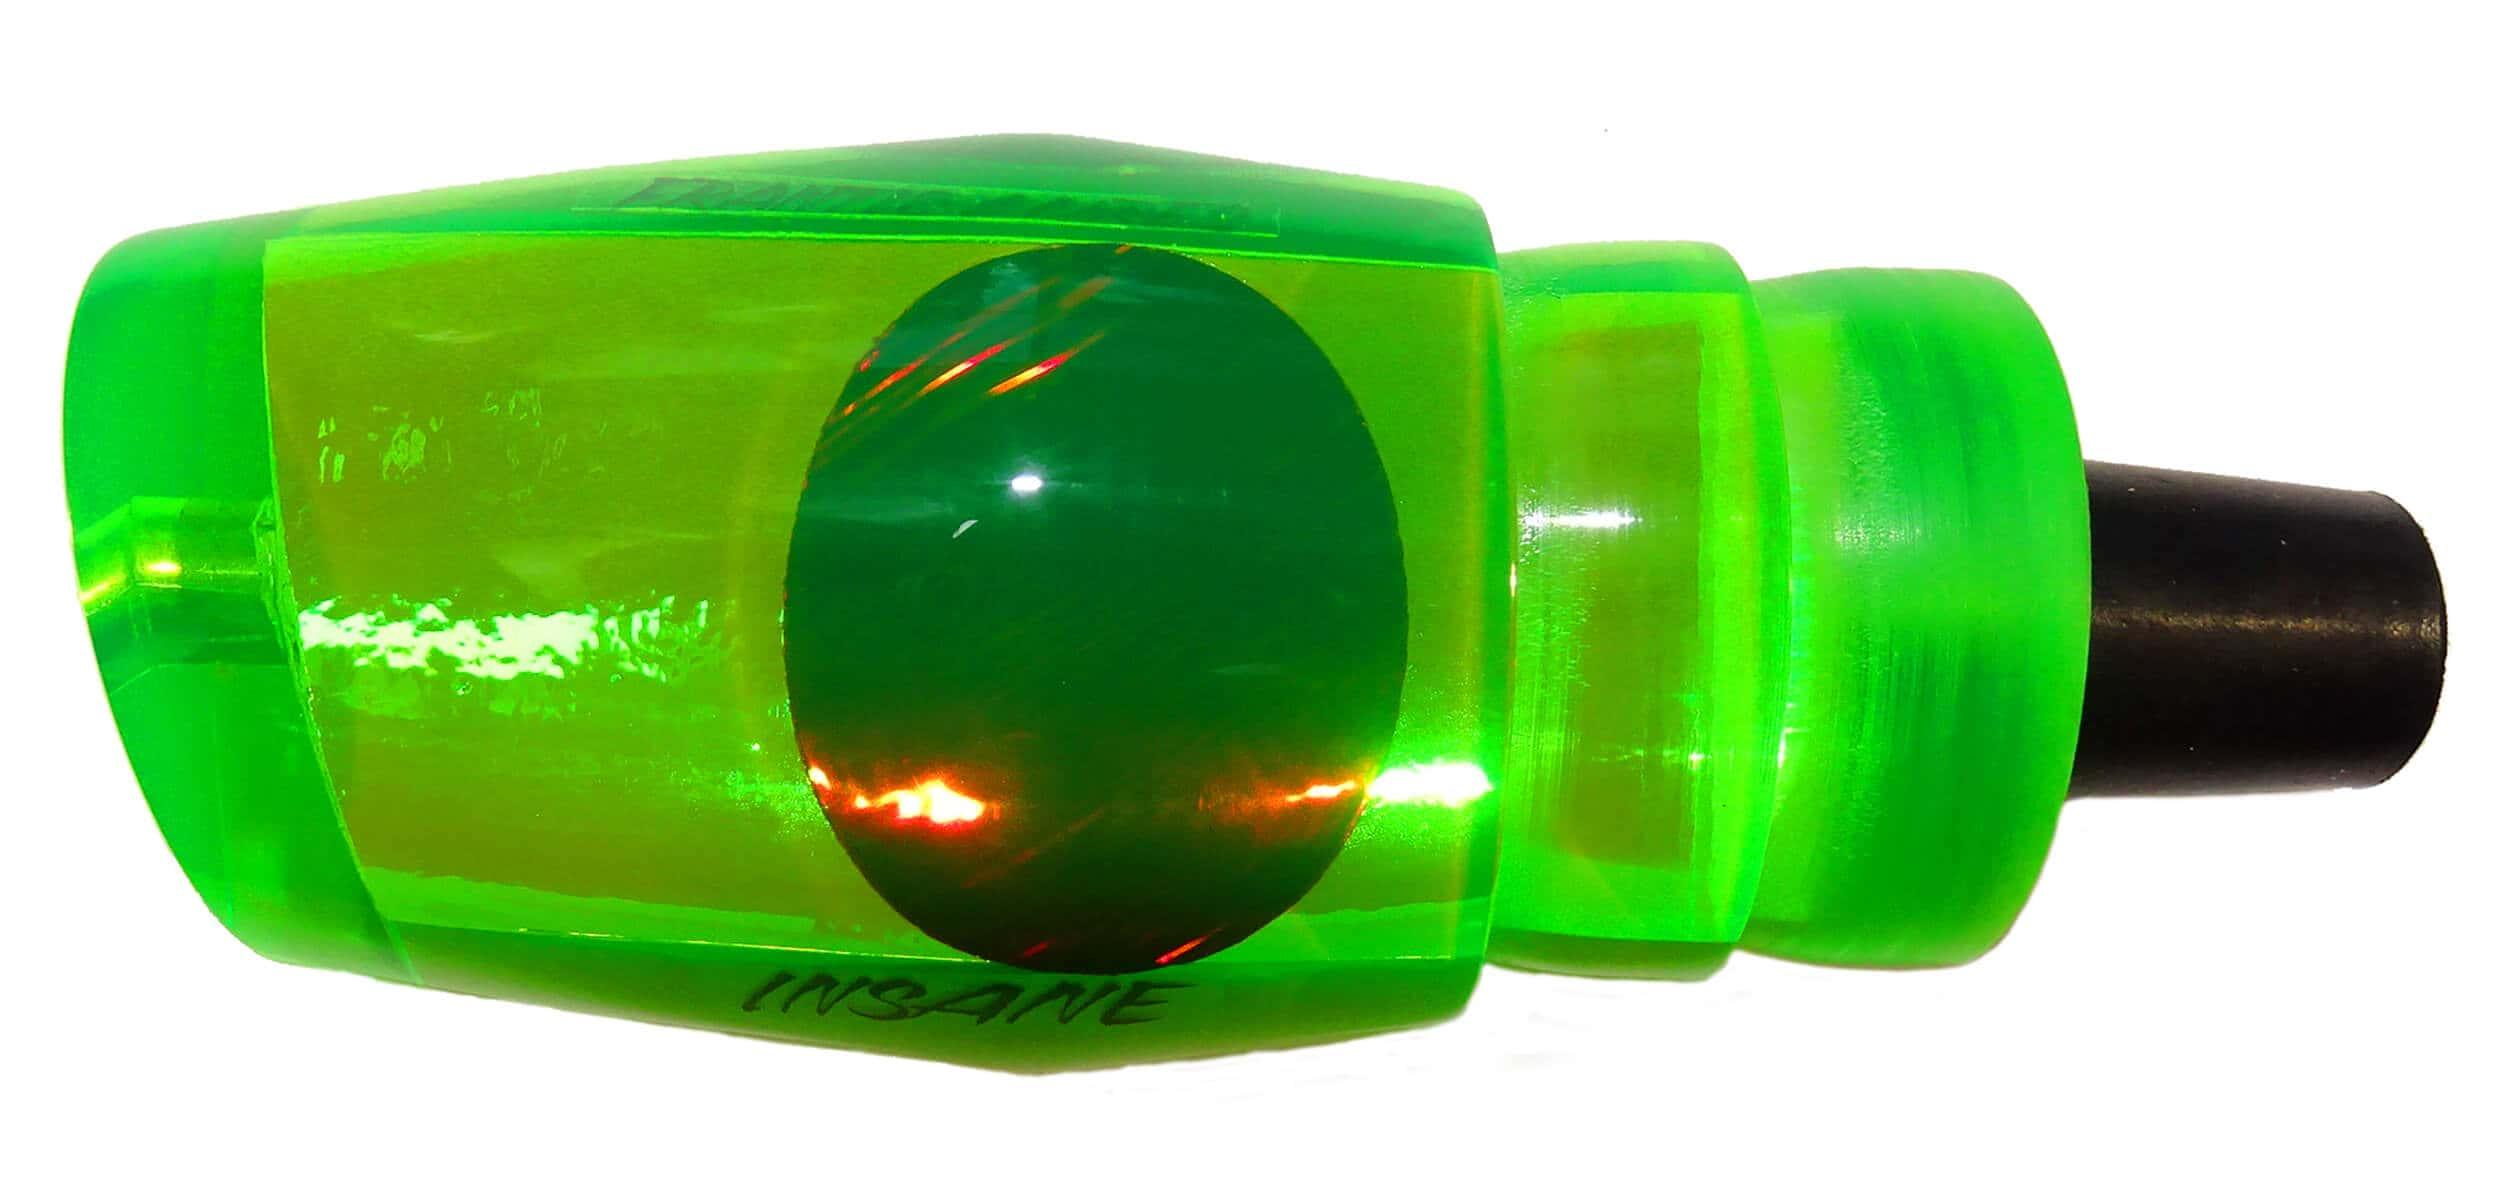 Frantic Lures - Insane Series - Head - Fluoro Green